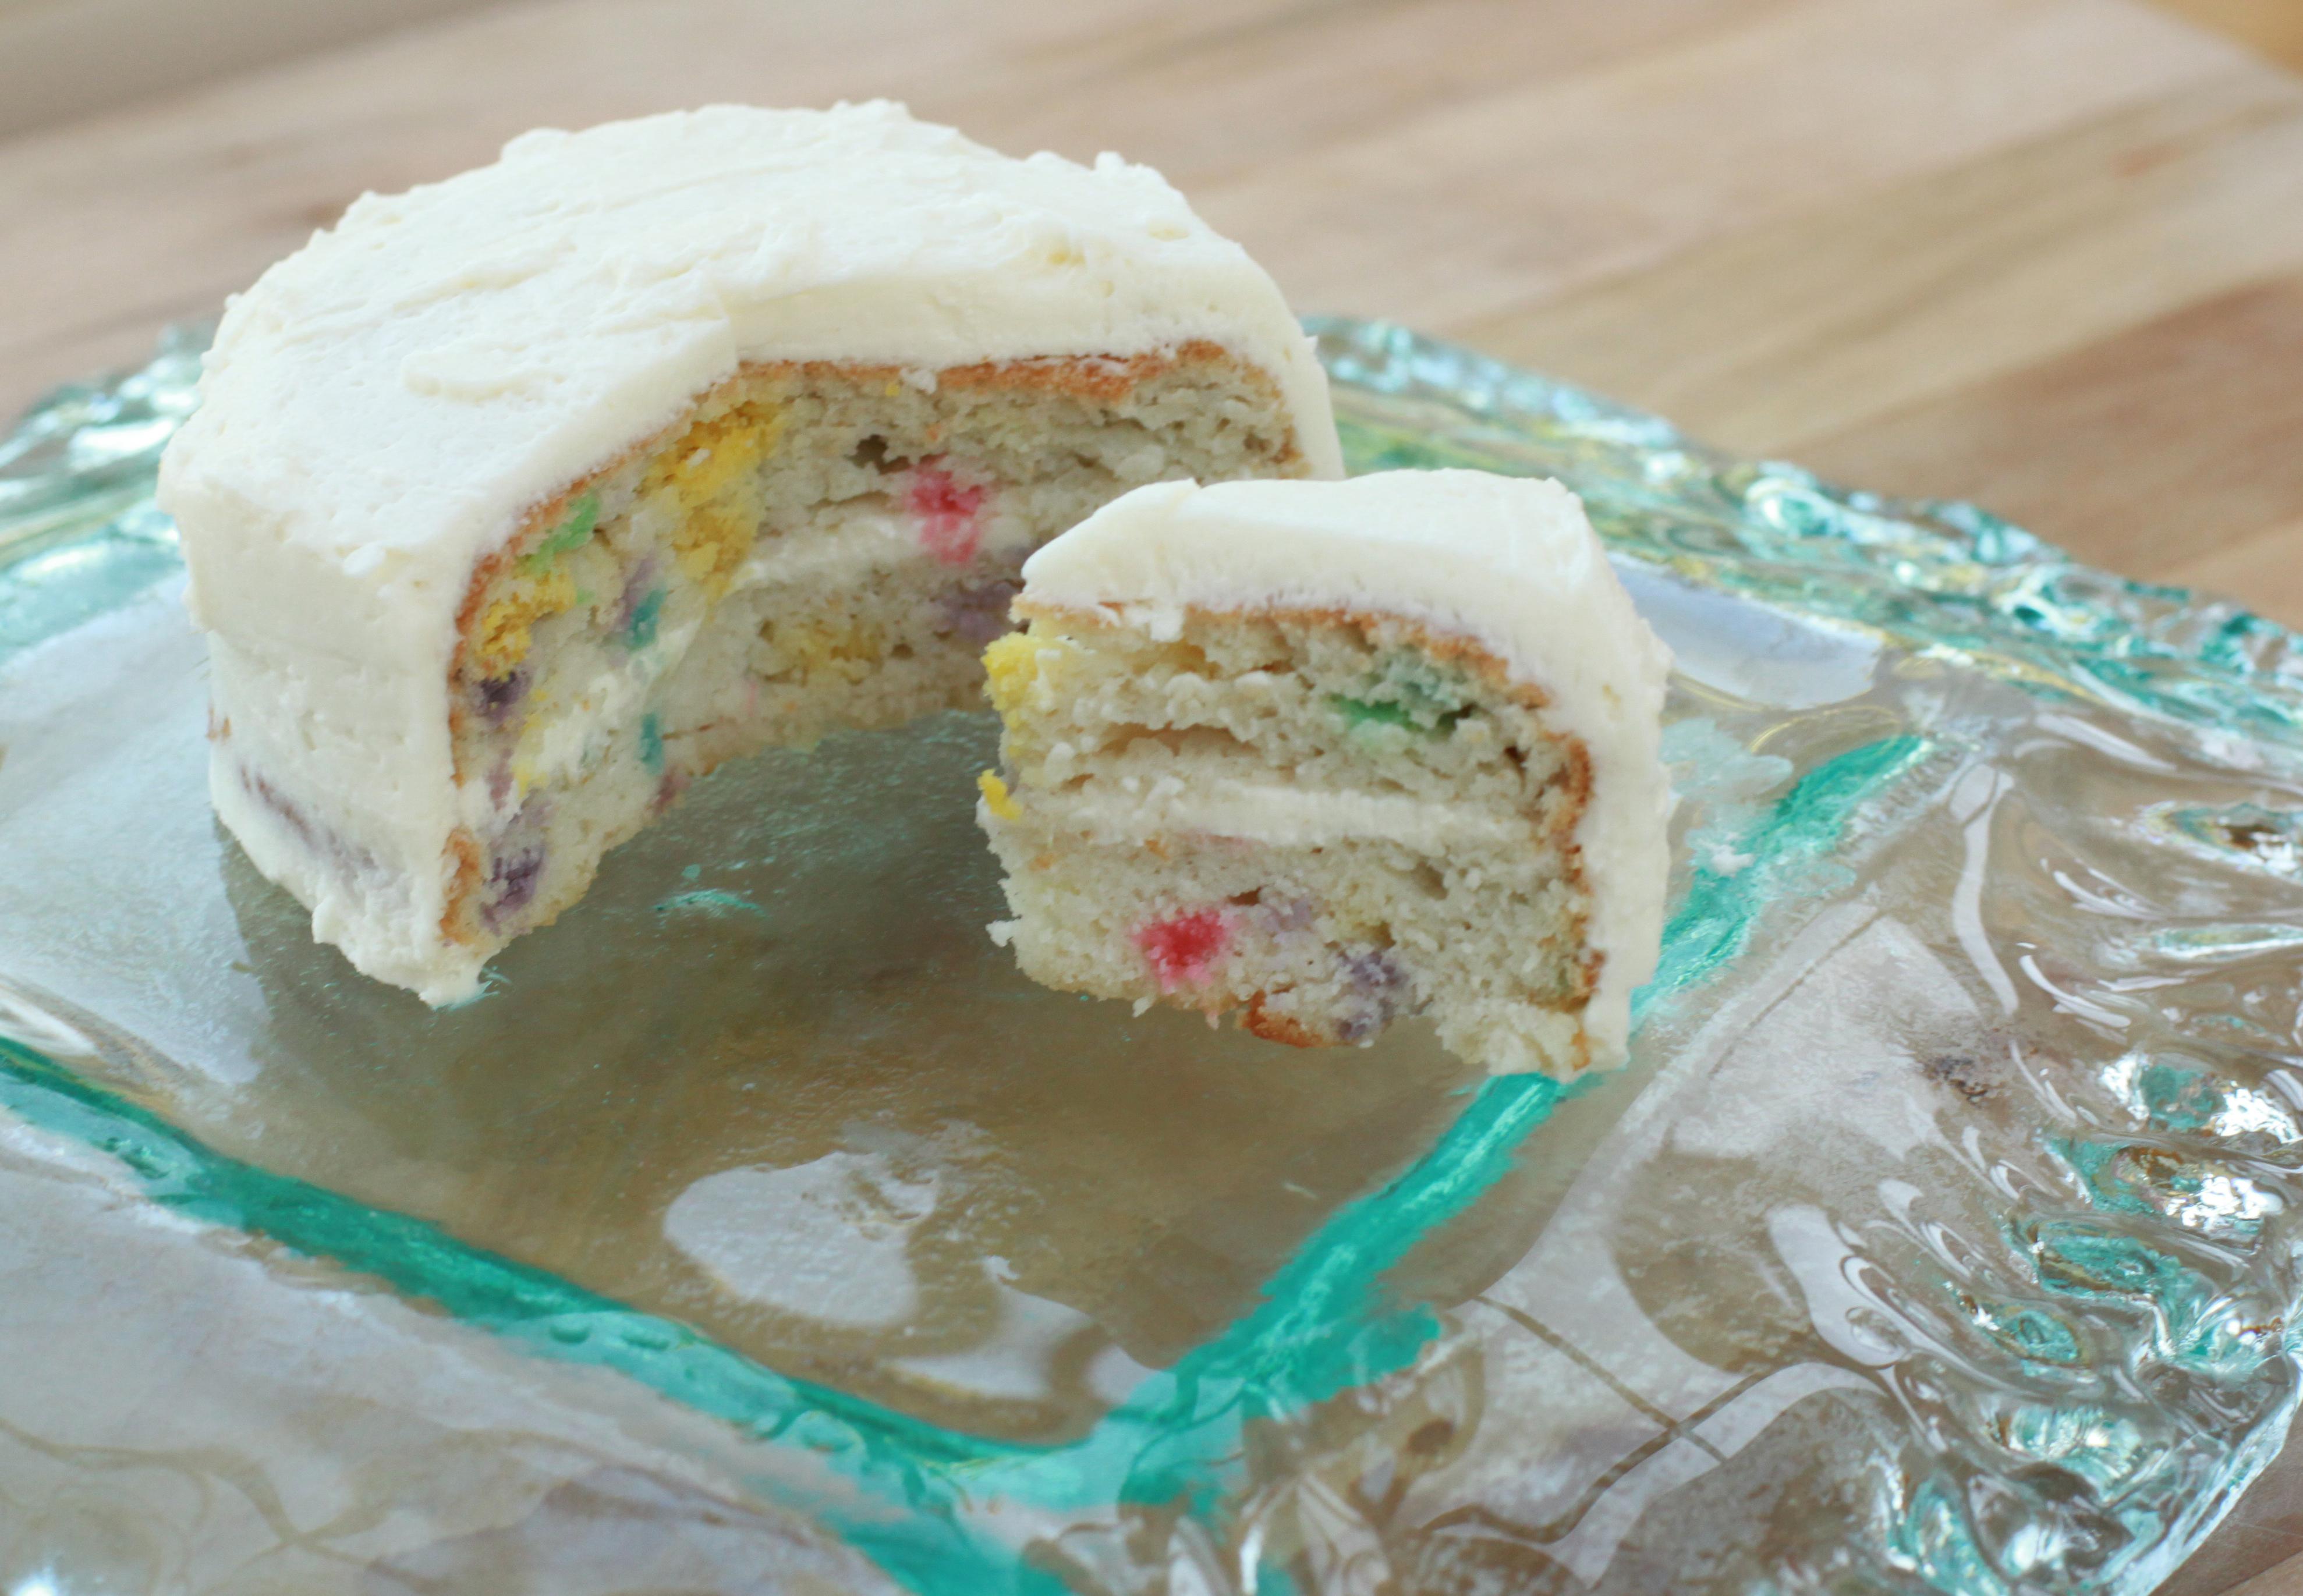 Sprinkle birthday cake recipes